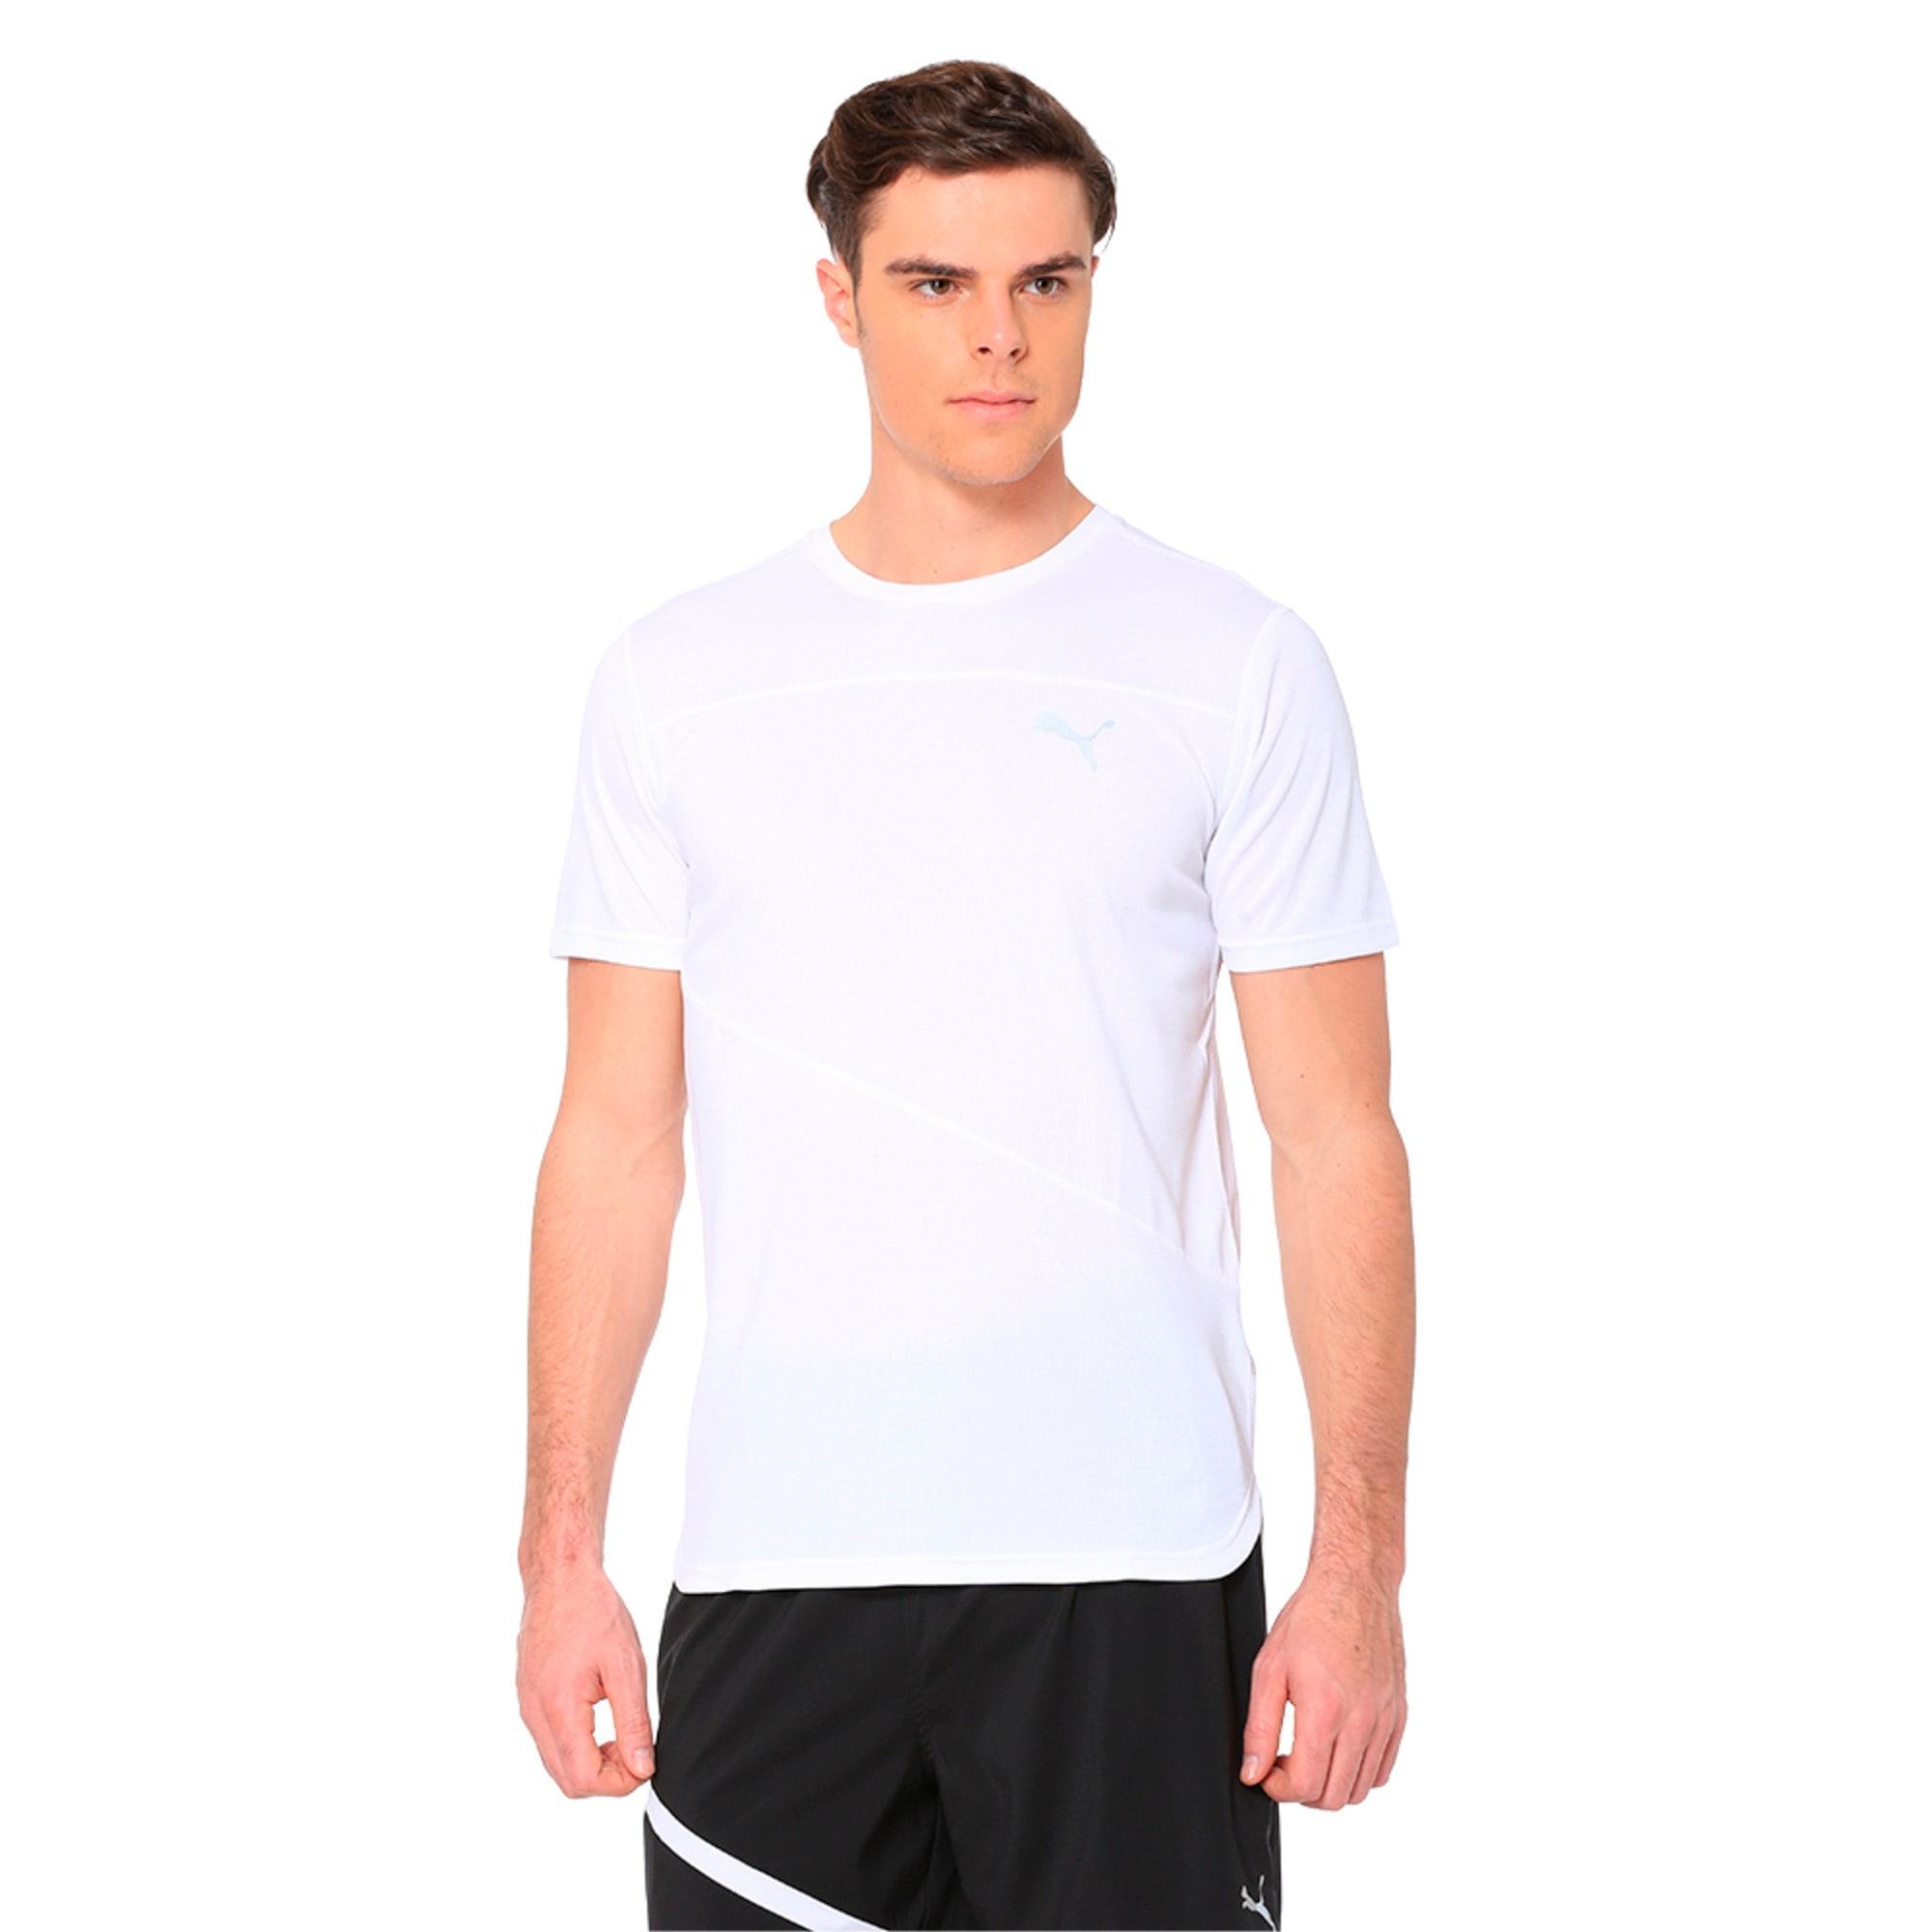 Thumbnail 1 of Running Men's IGNITE Mono T-Shirt, Puma White, medium-IND